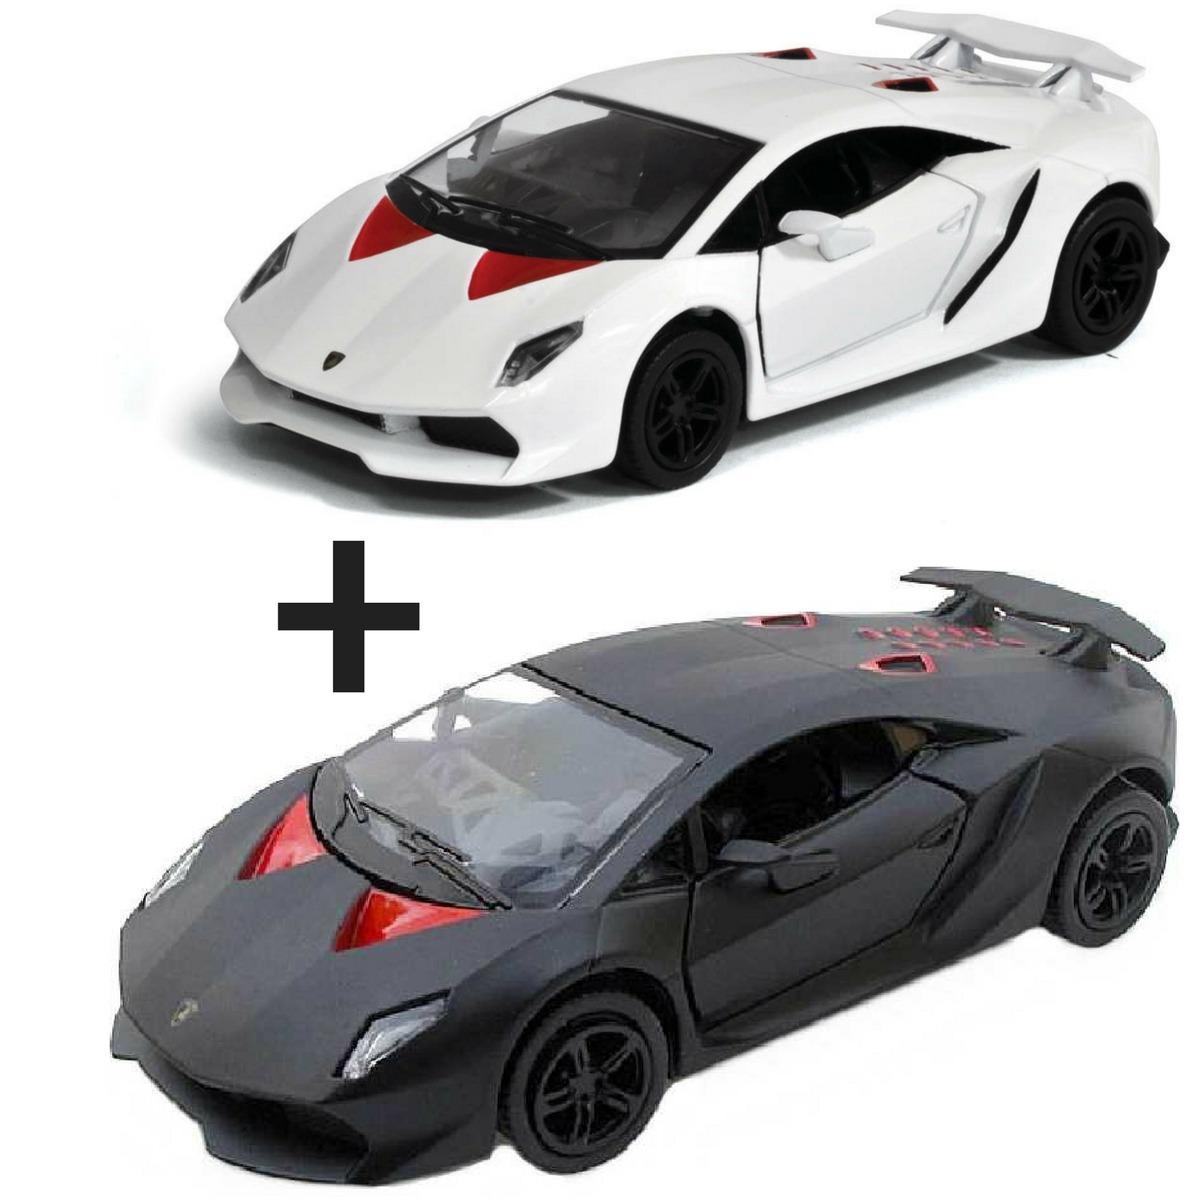 2 Miniatura Carrinho De Colecao Lamborghini Sesto Elemento R 63